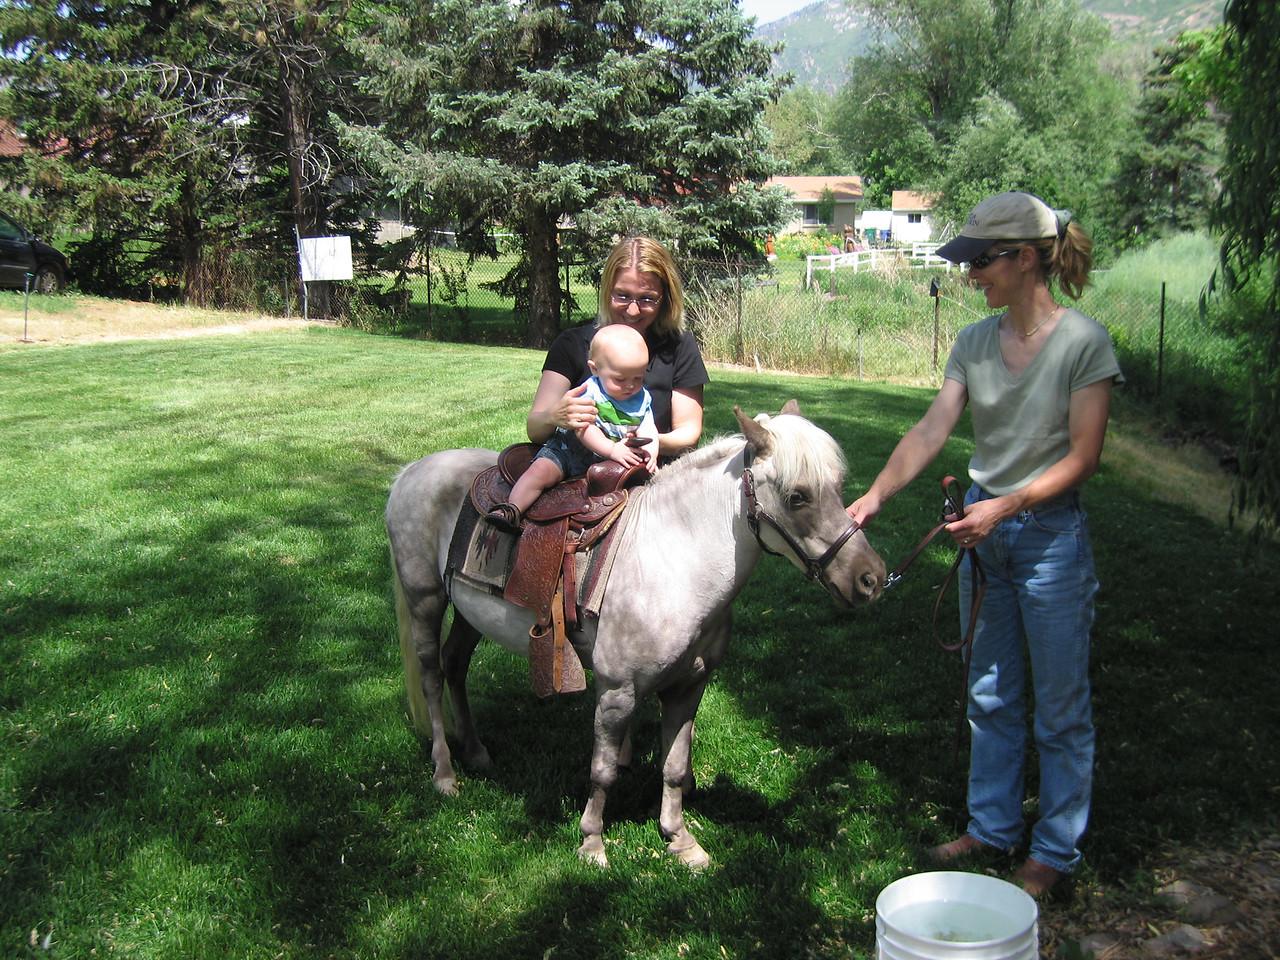 Jack on the pony